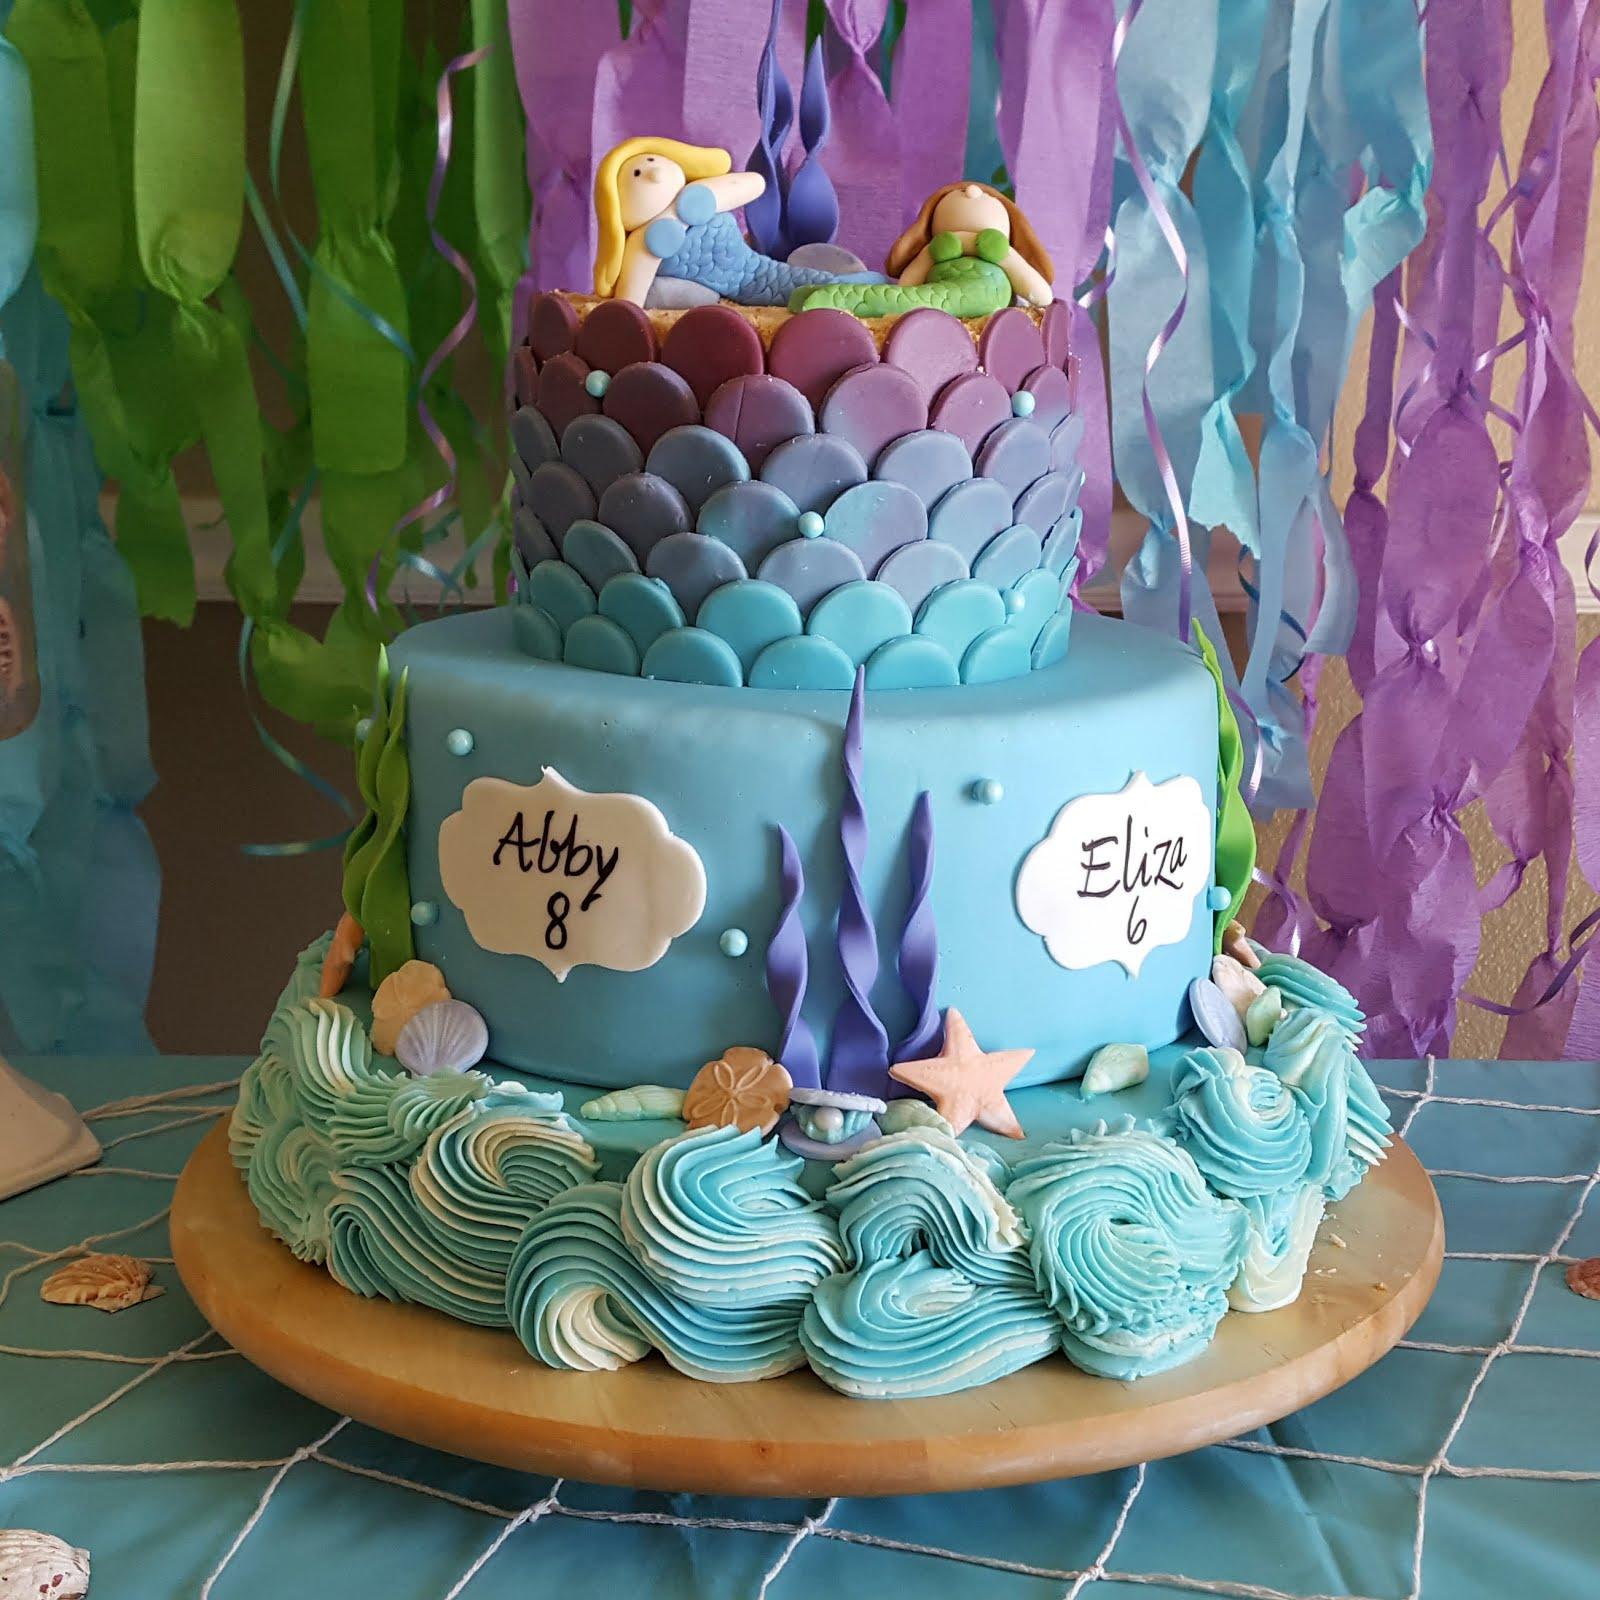 Patty Cakes Bakery Strawberry Shortcake Birthday Party